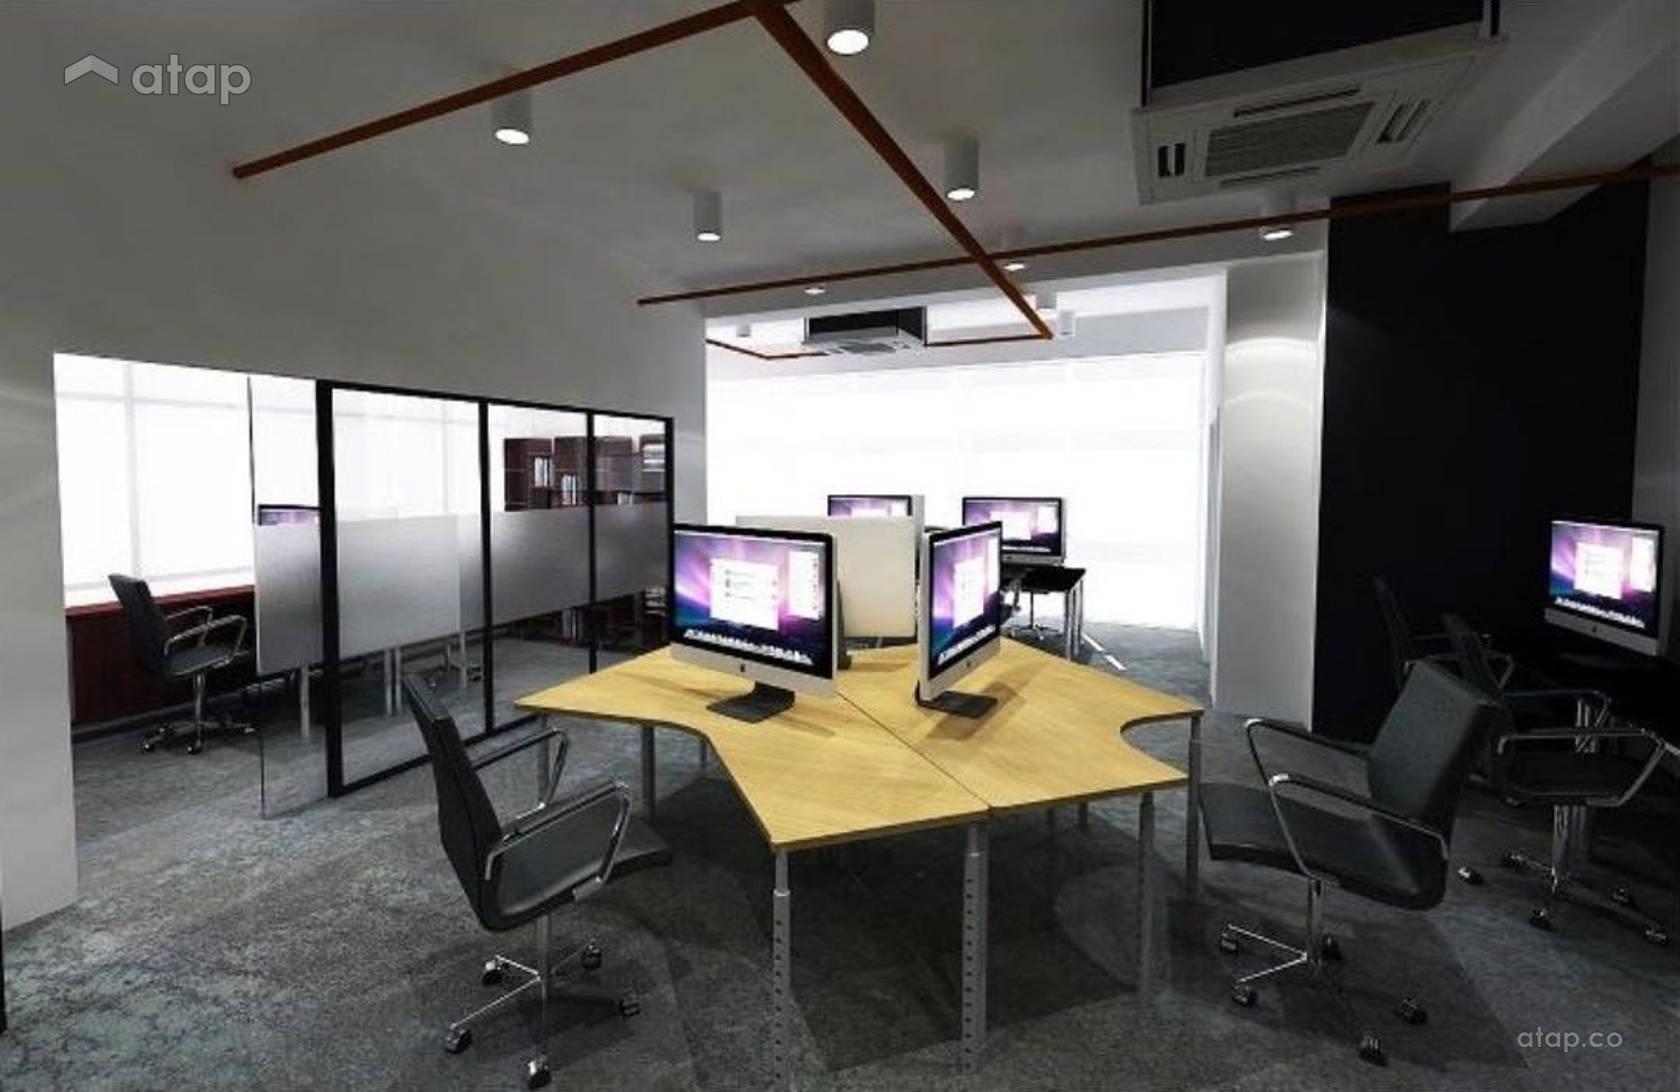 office renovation ideas. Office Renovation Ideas 4 Thirteen Media Interior Design Photos S